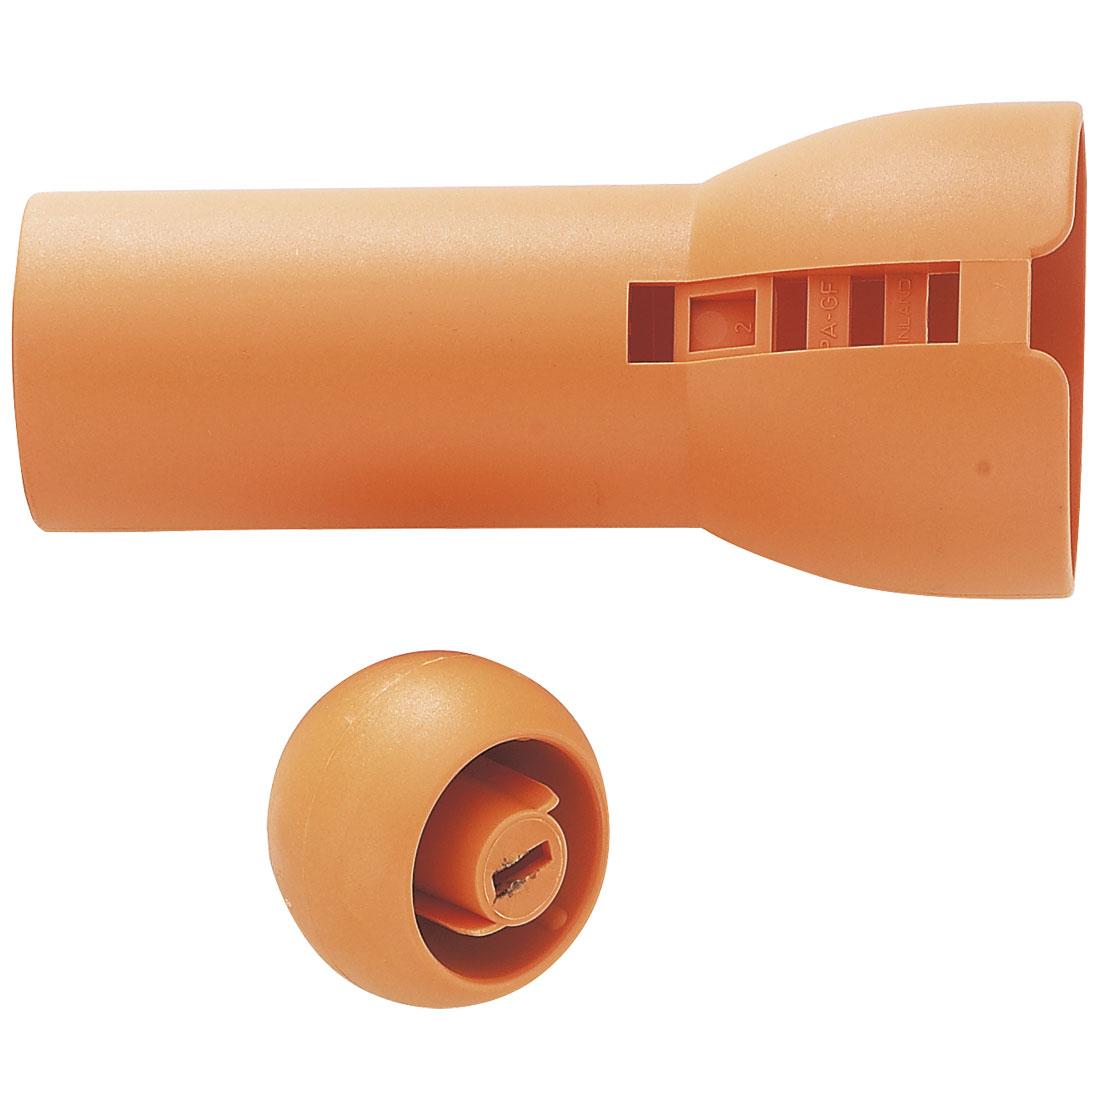 1001730-handle-and-orange-knob-for-115560.jpg